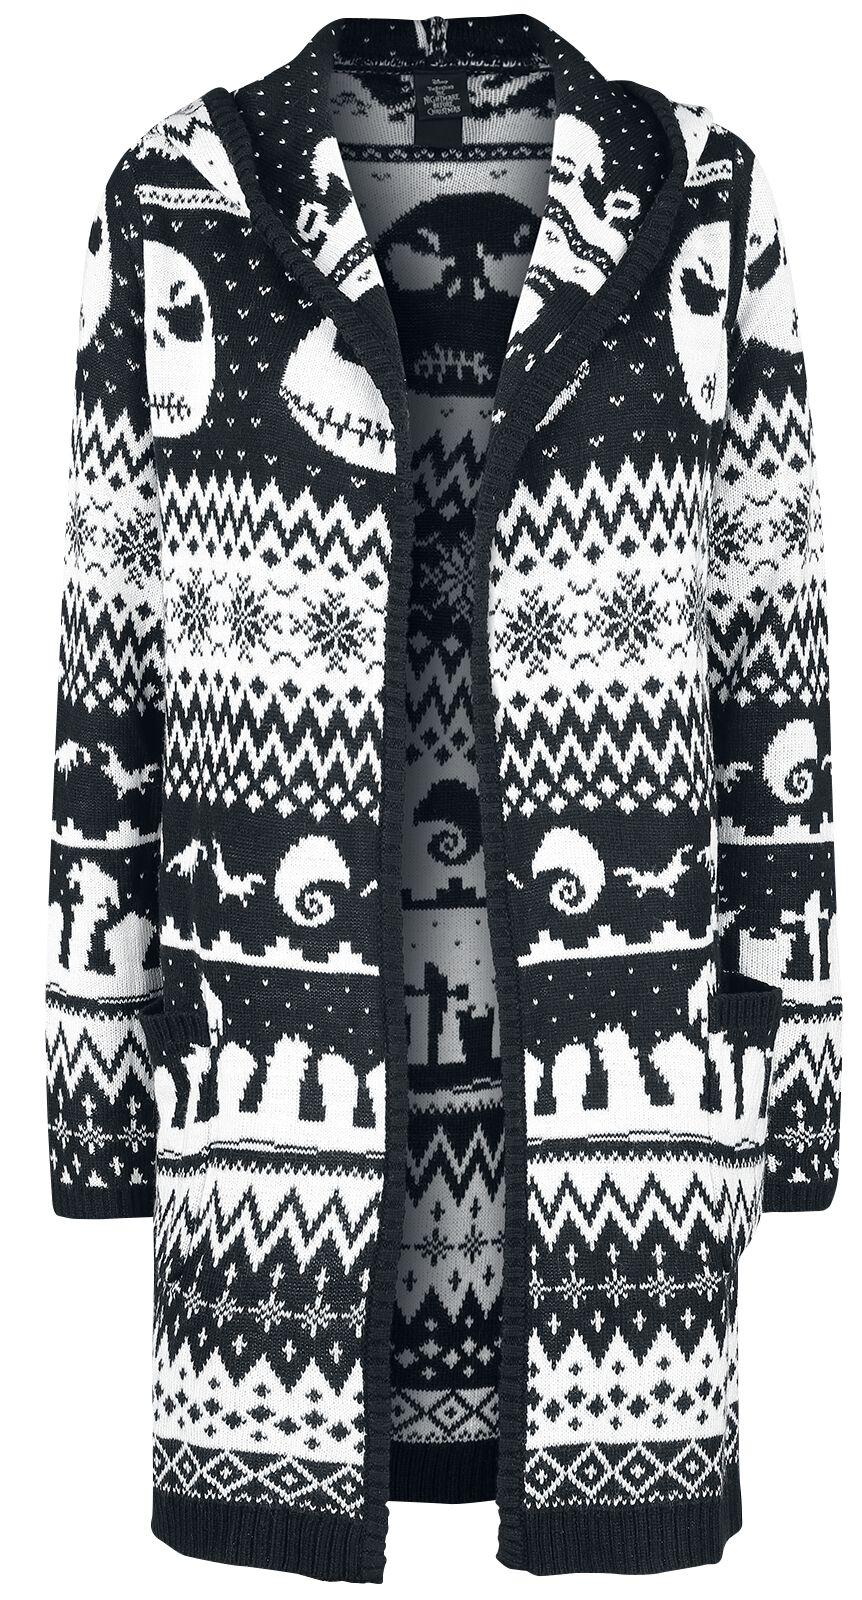 Image of   The Nightmare Before Christmas Intarsia Toss Pigecardigan sort-hvid